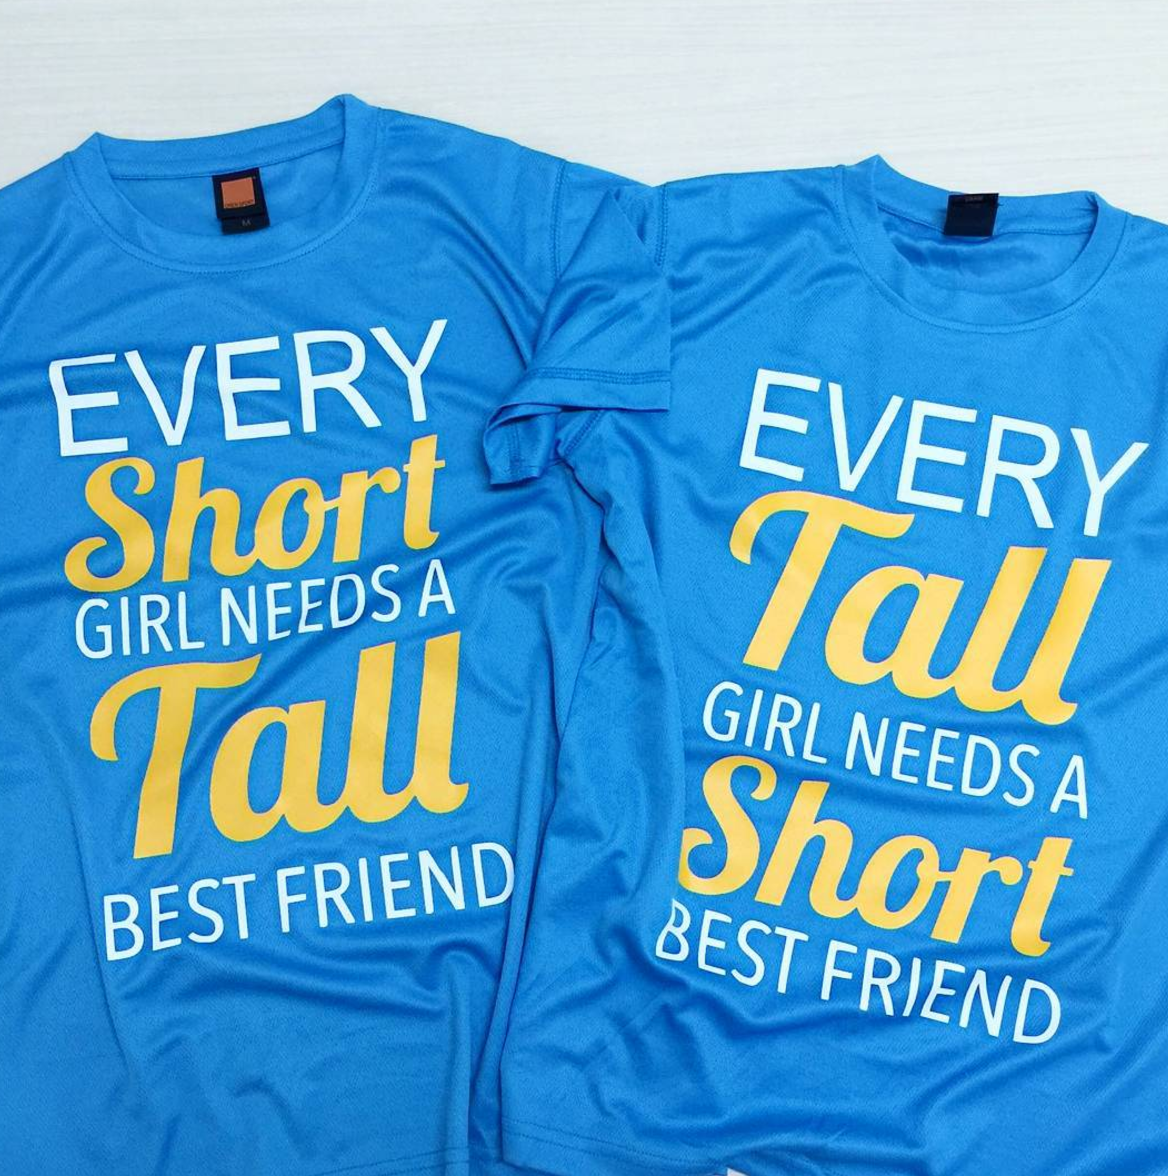 Customise ladies microfibre blue t-shirt